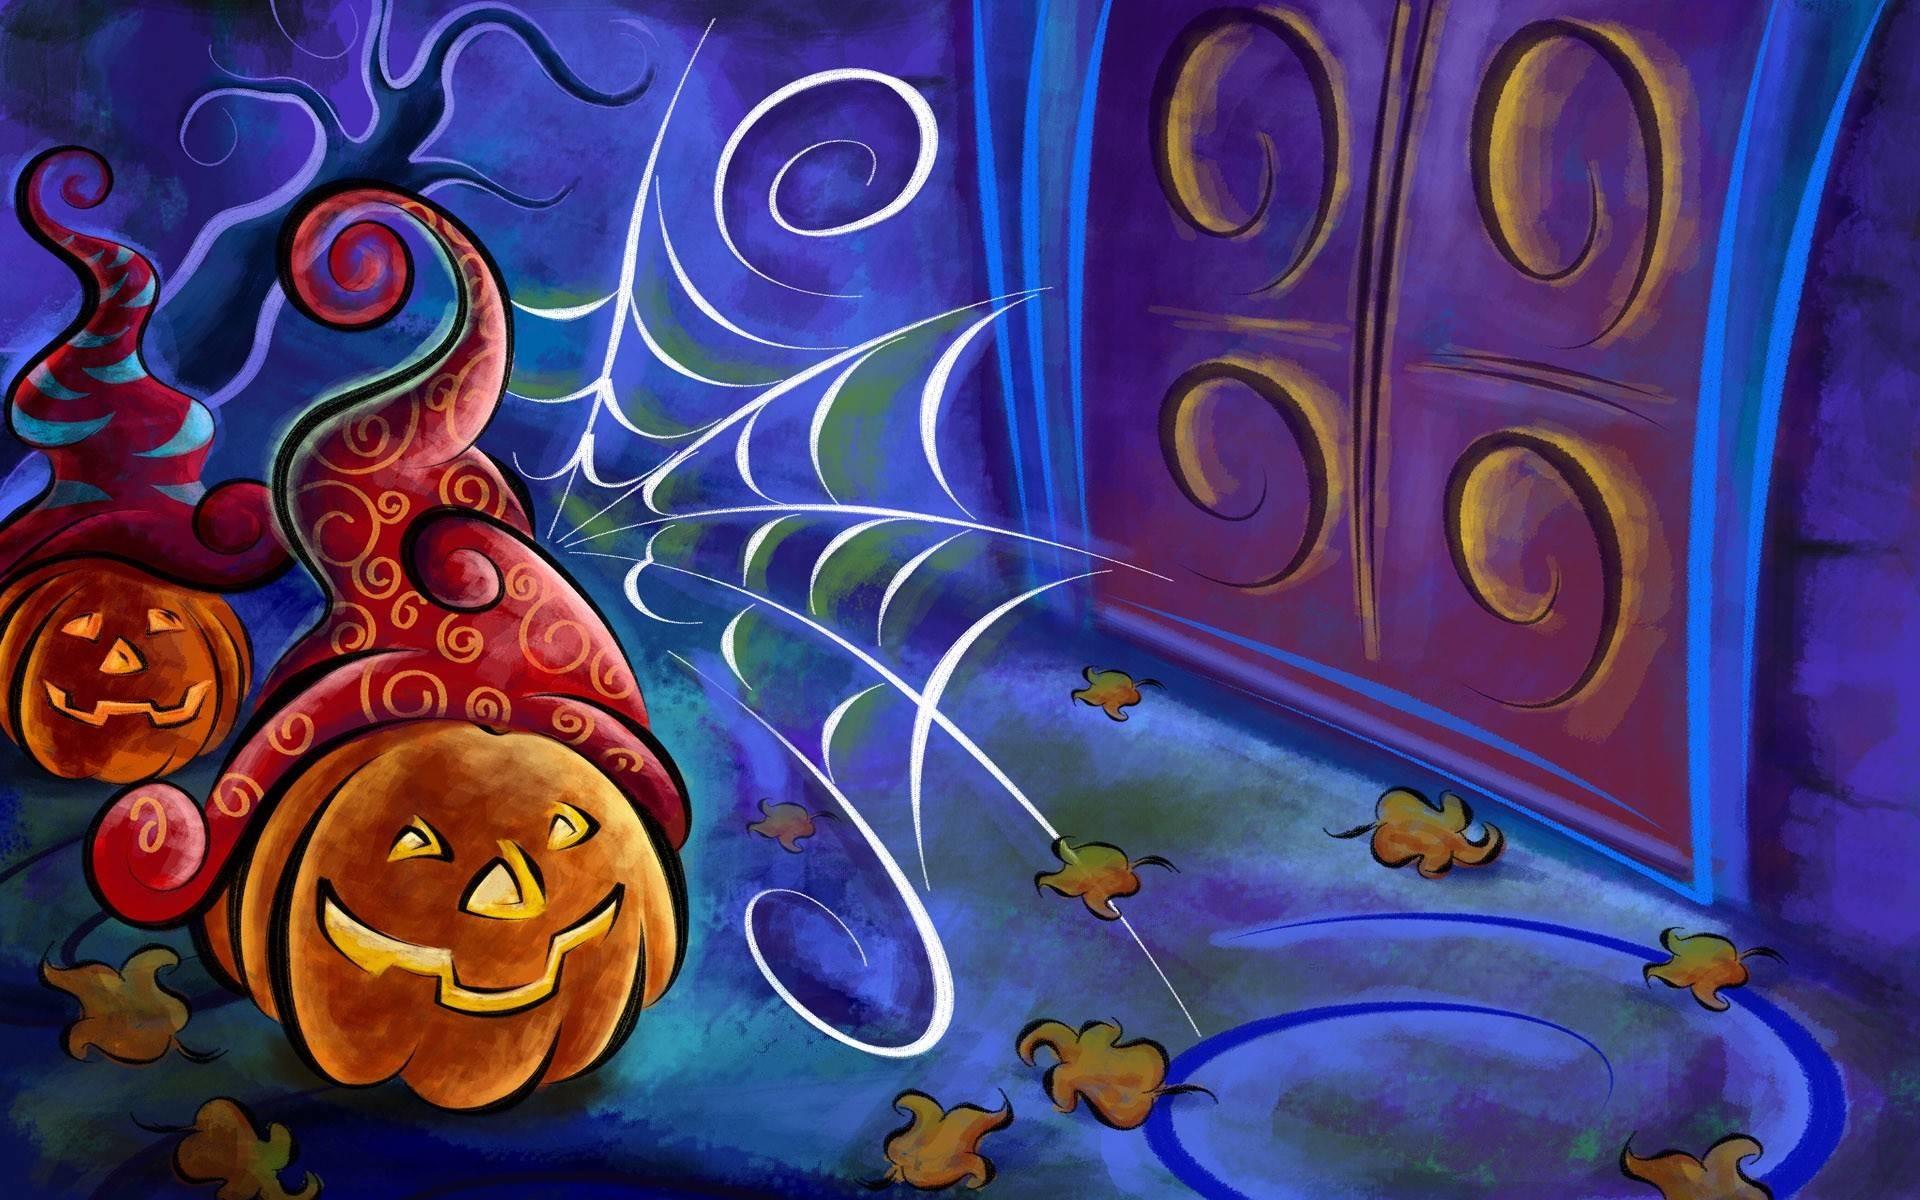 halloween screensavers wallpapers – www.wallpaper-free-download.com